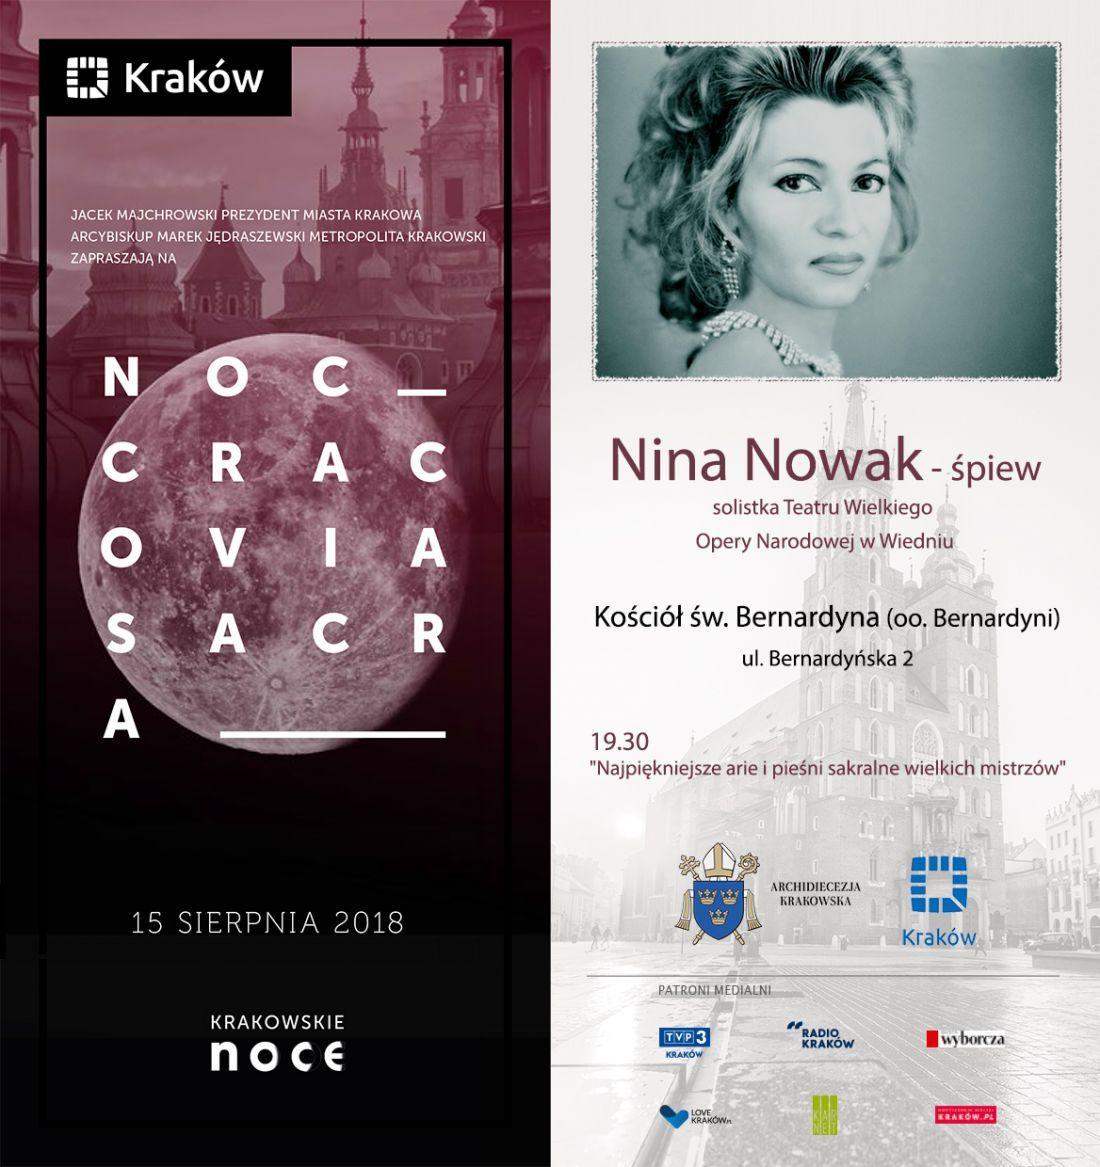 Cracovia Carca 2018